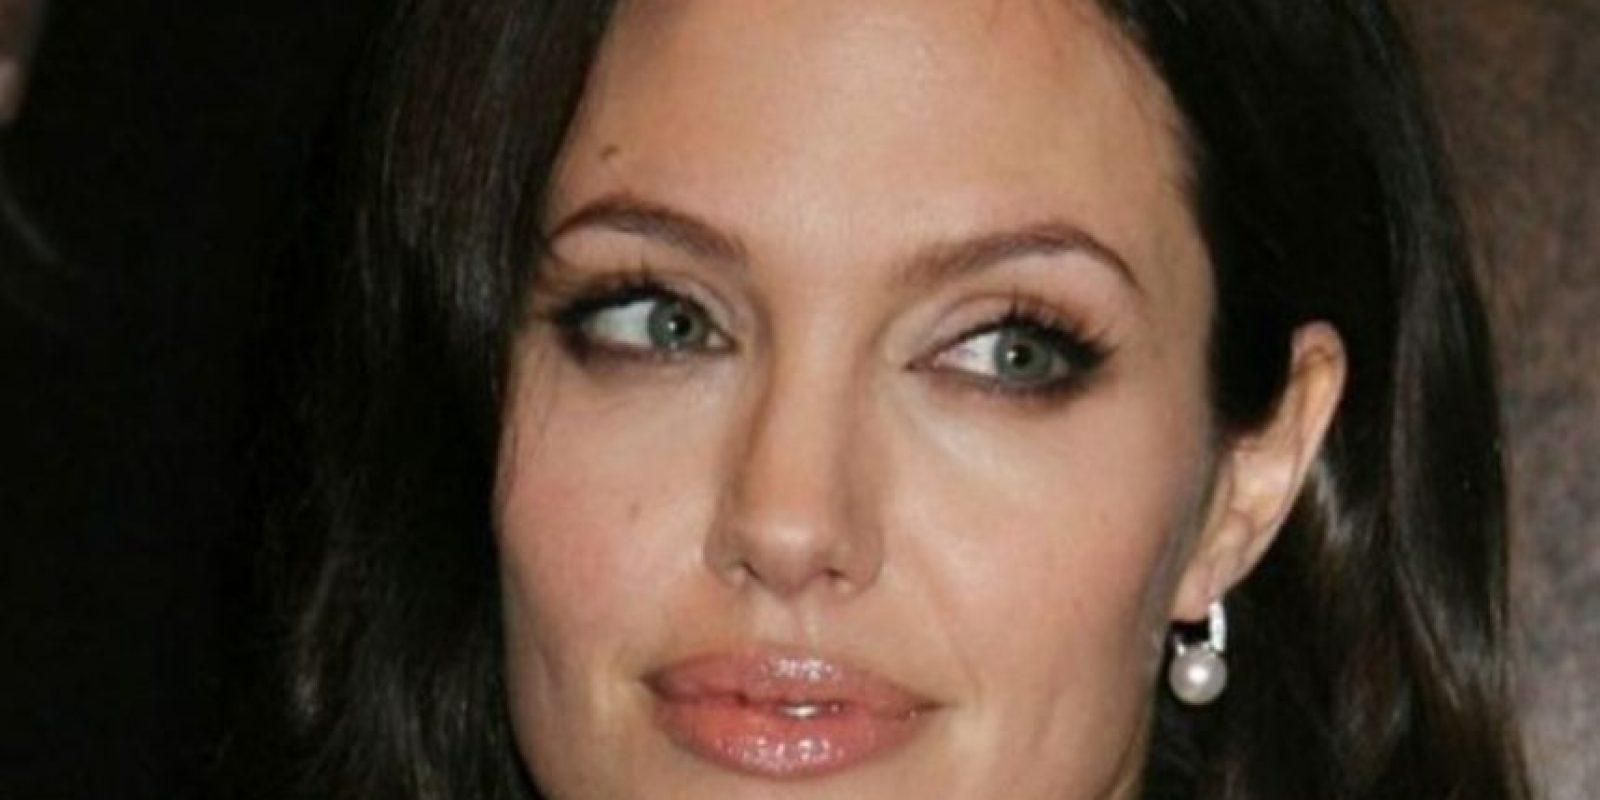 Así es, este gran tatuaje es de Angelina Jolie Foto:Getty Images